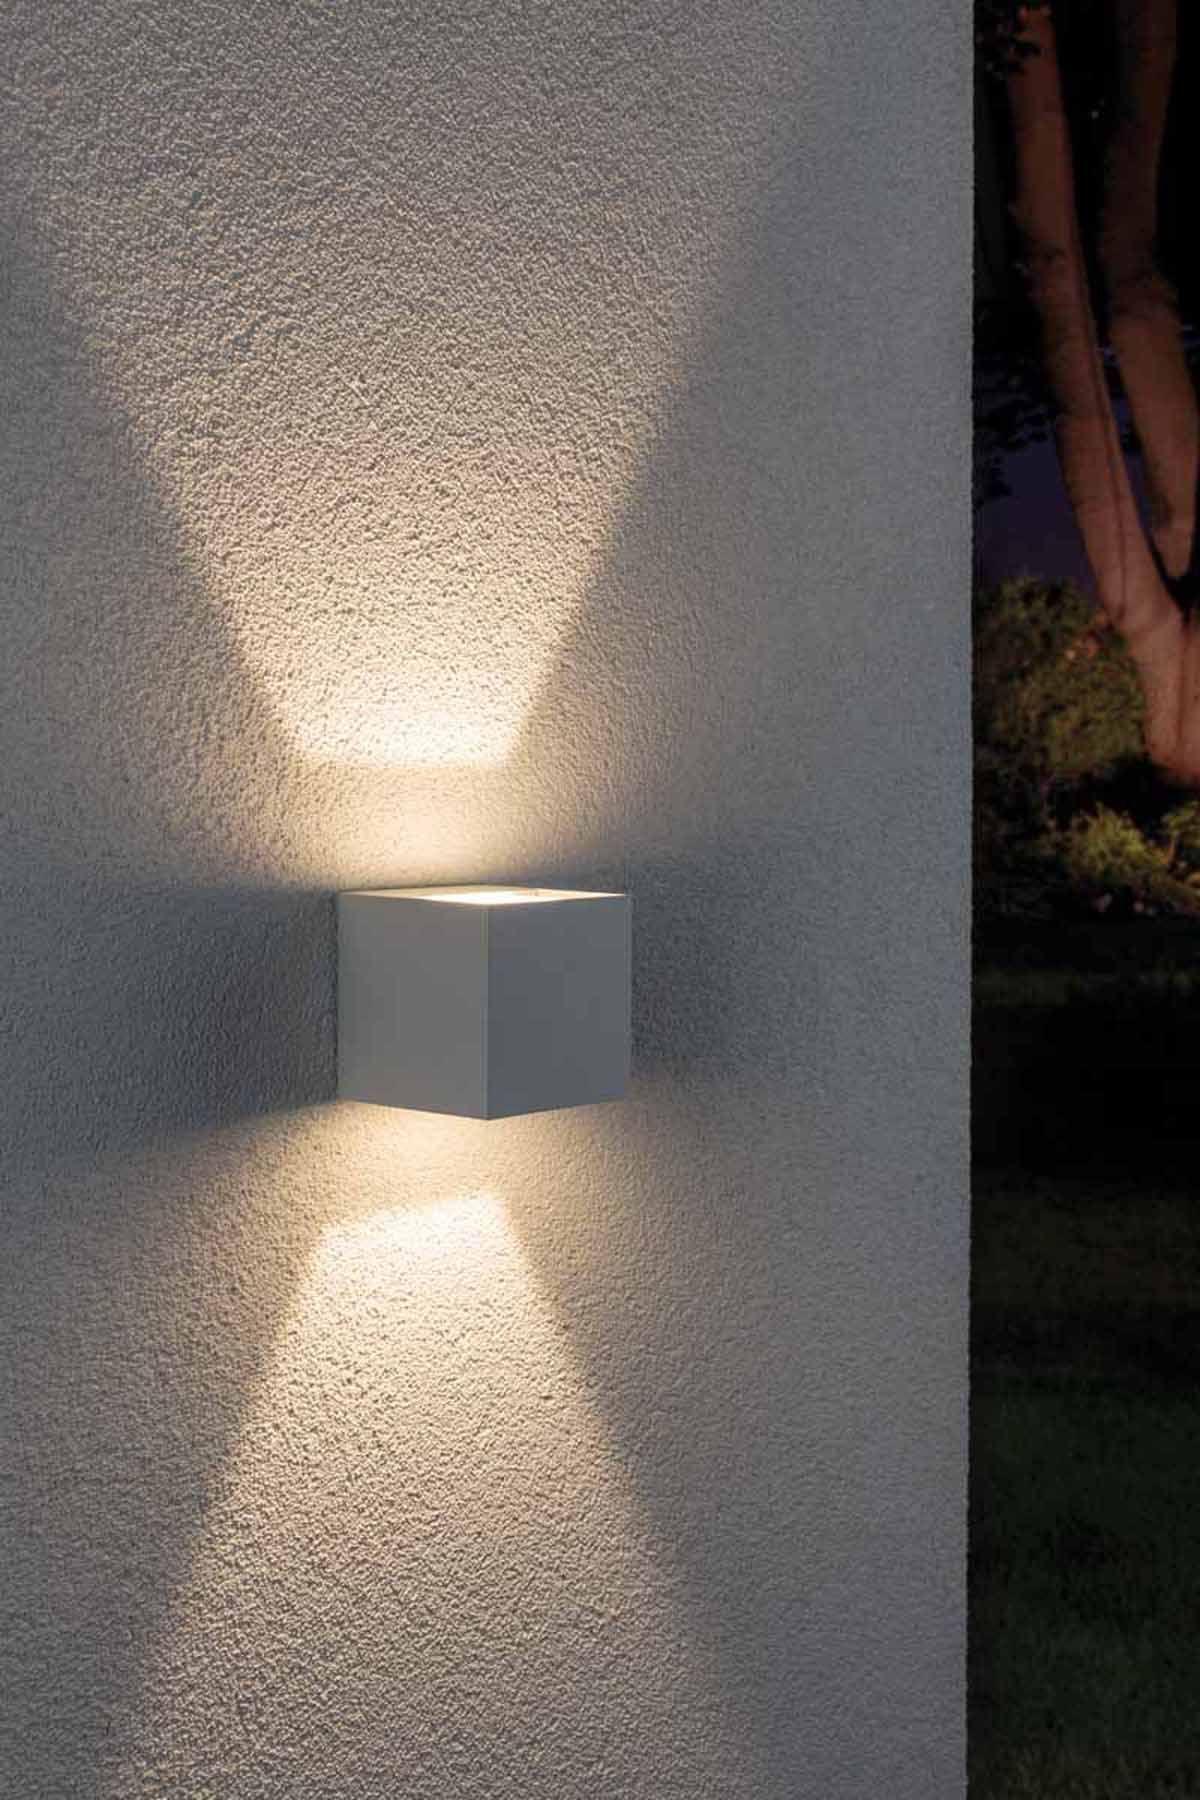 Wandaufbauleuchte Einrichtungsideen Aussenbeleuchtung Aussenleuchten Lichterketten Auenleuchten Beleuchtung Aussenleuchten Beleuchtung Balkon Beleuchtung